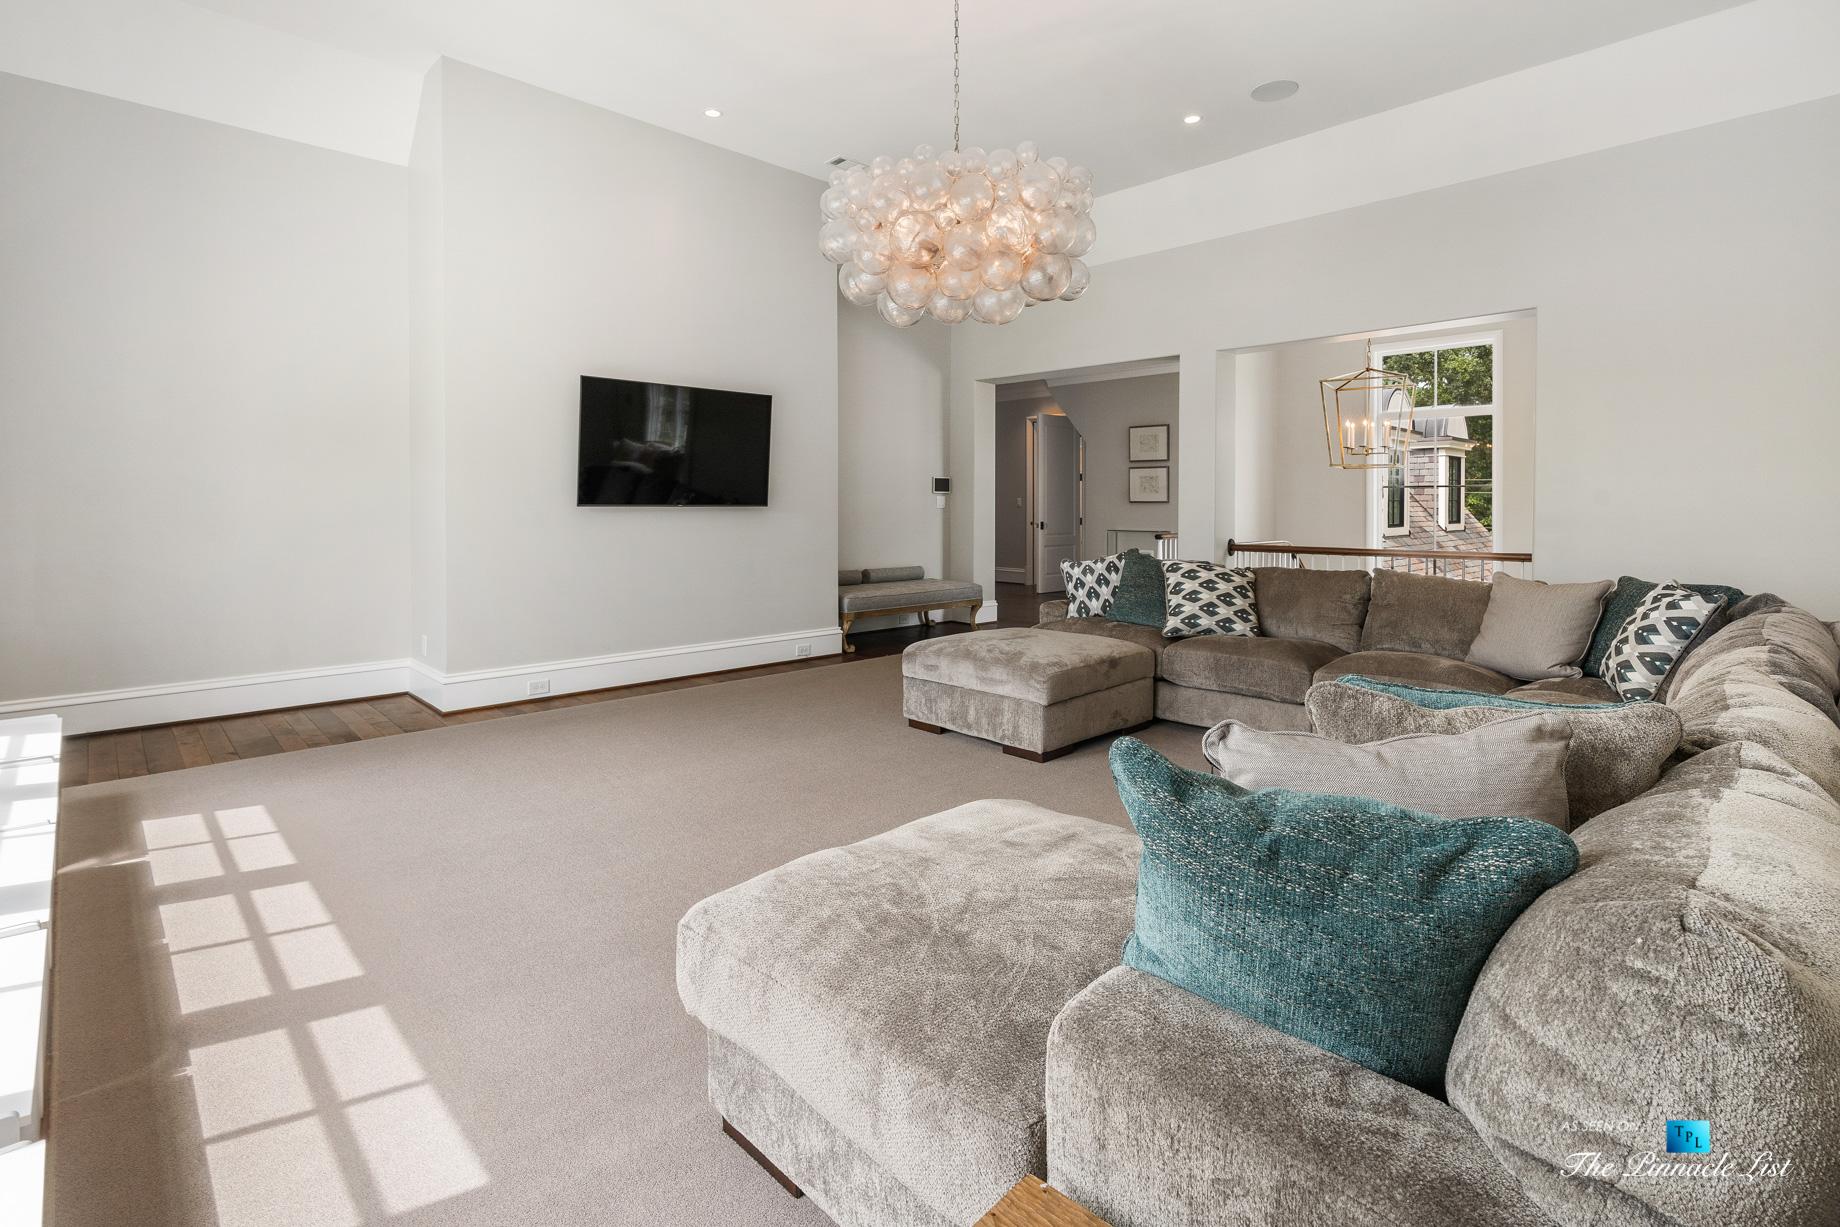 1150 W Garmon Rd, Atlanta, GA, USA – Recreation Room – Luxury Real Estate – Buckhead Estate Home